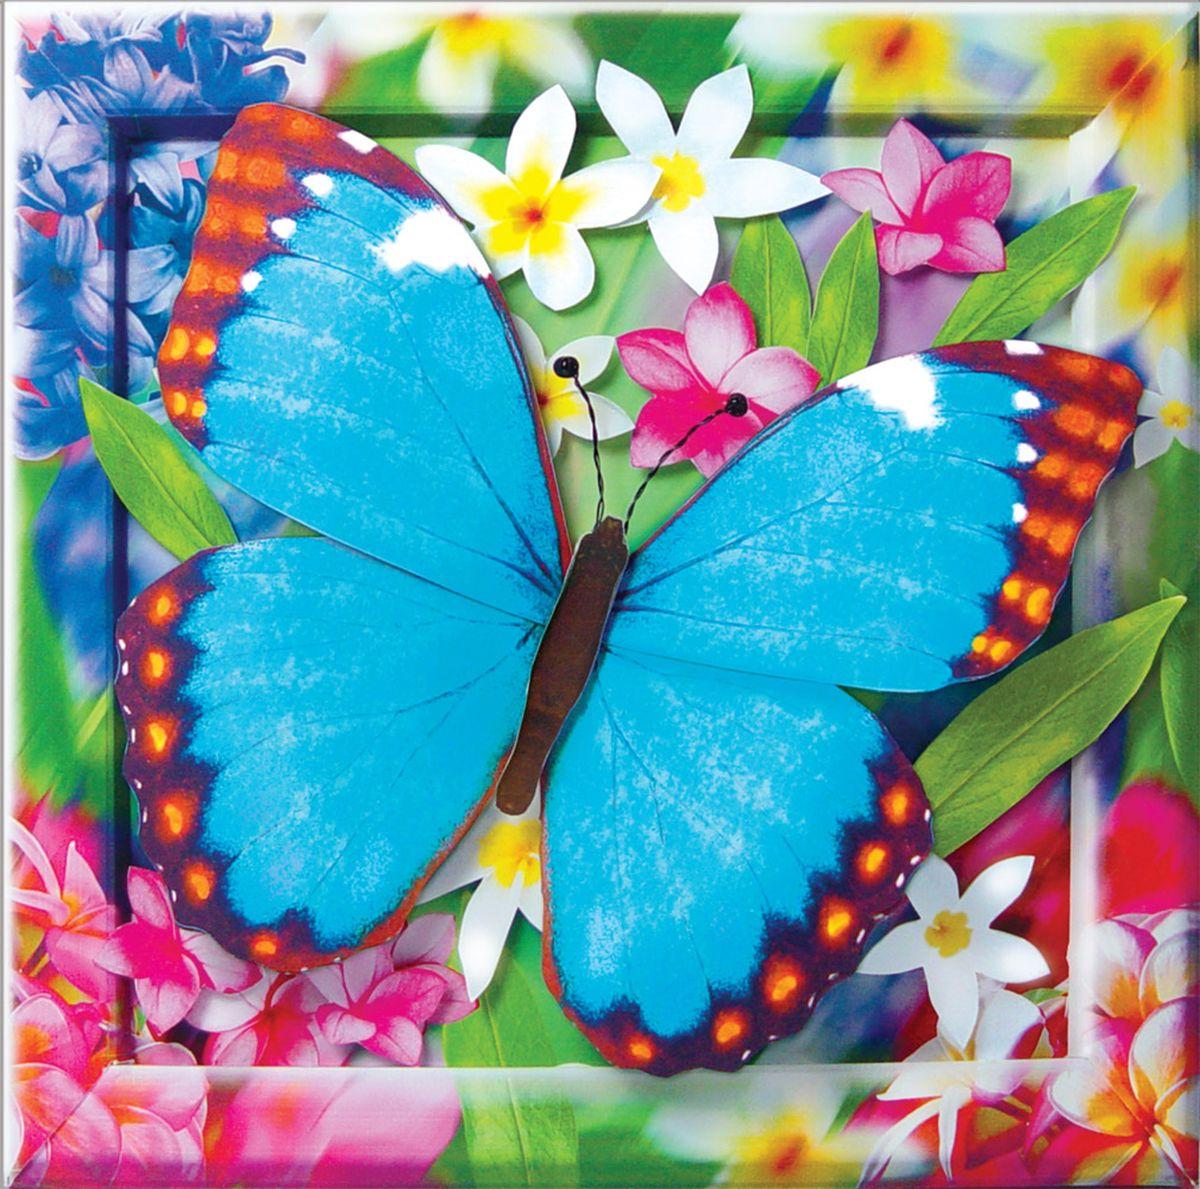 Картинки марта, набор для творчества открытка бабочки